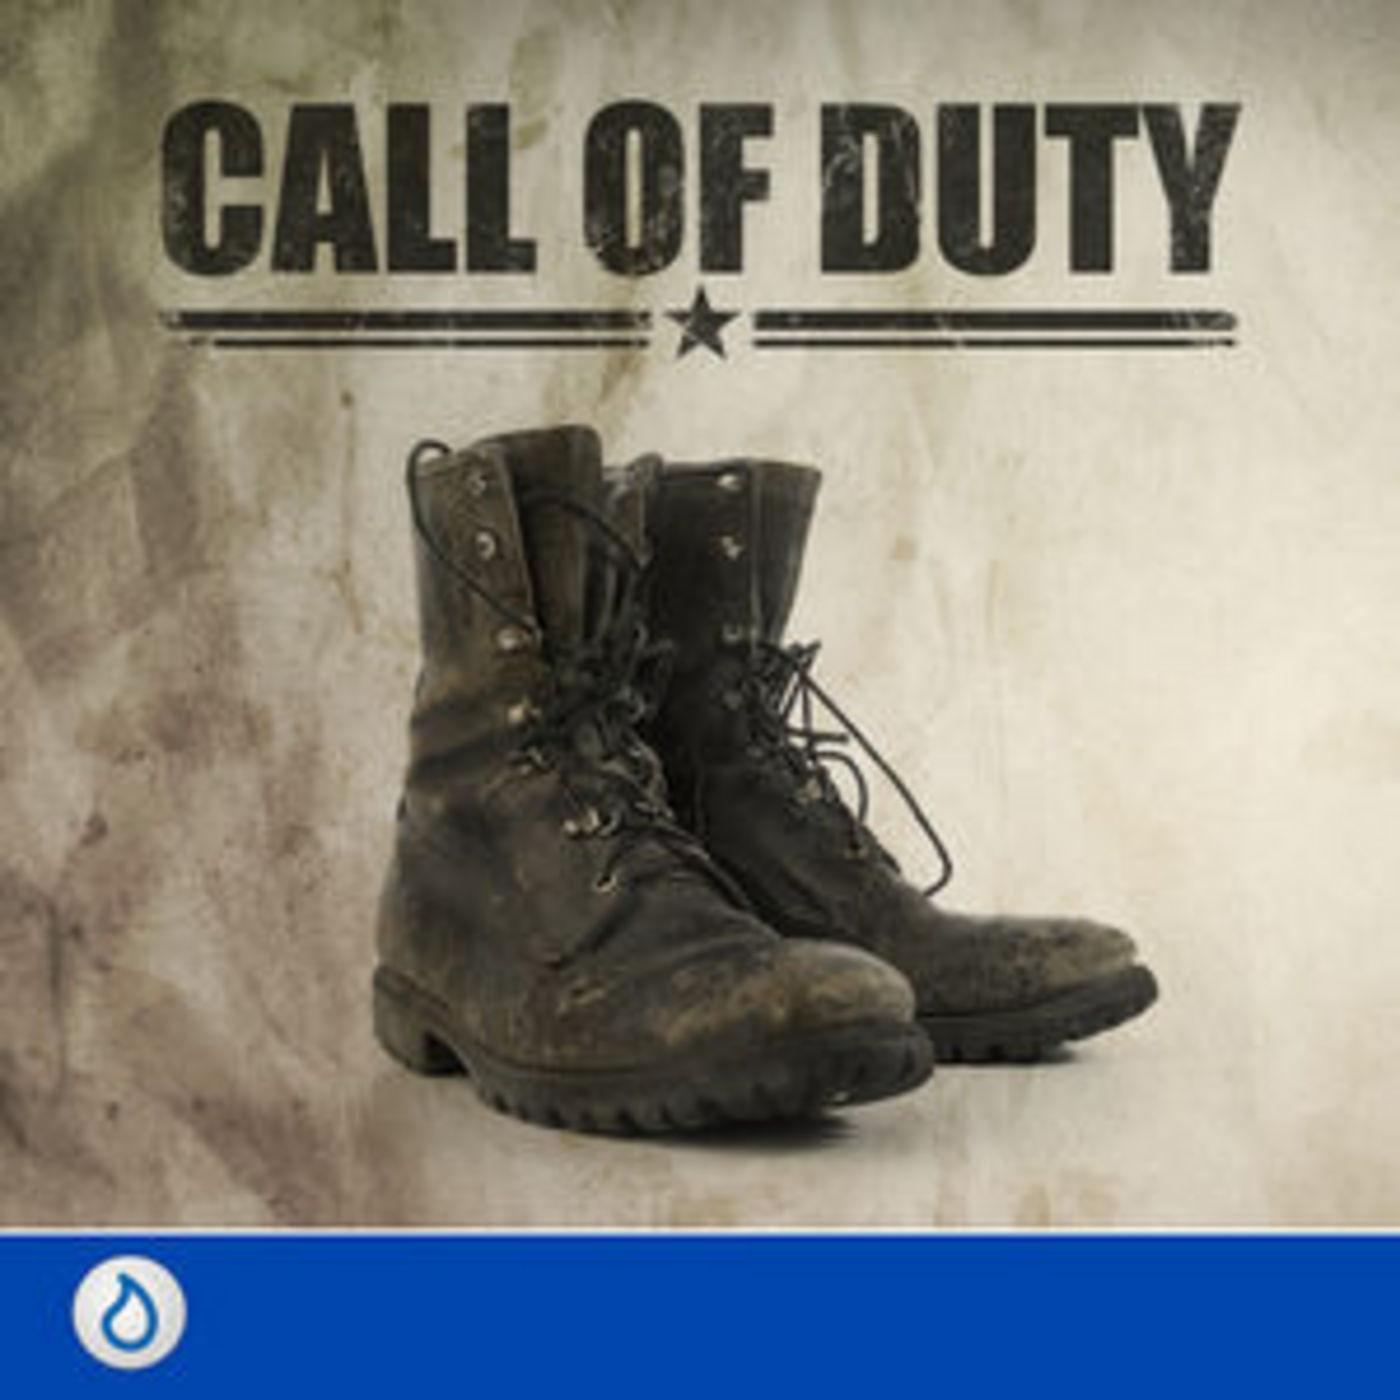 <![CDATA[Call of Duty]]>